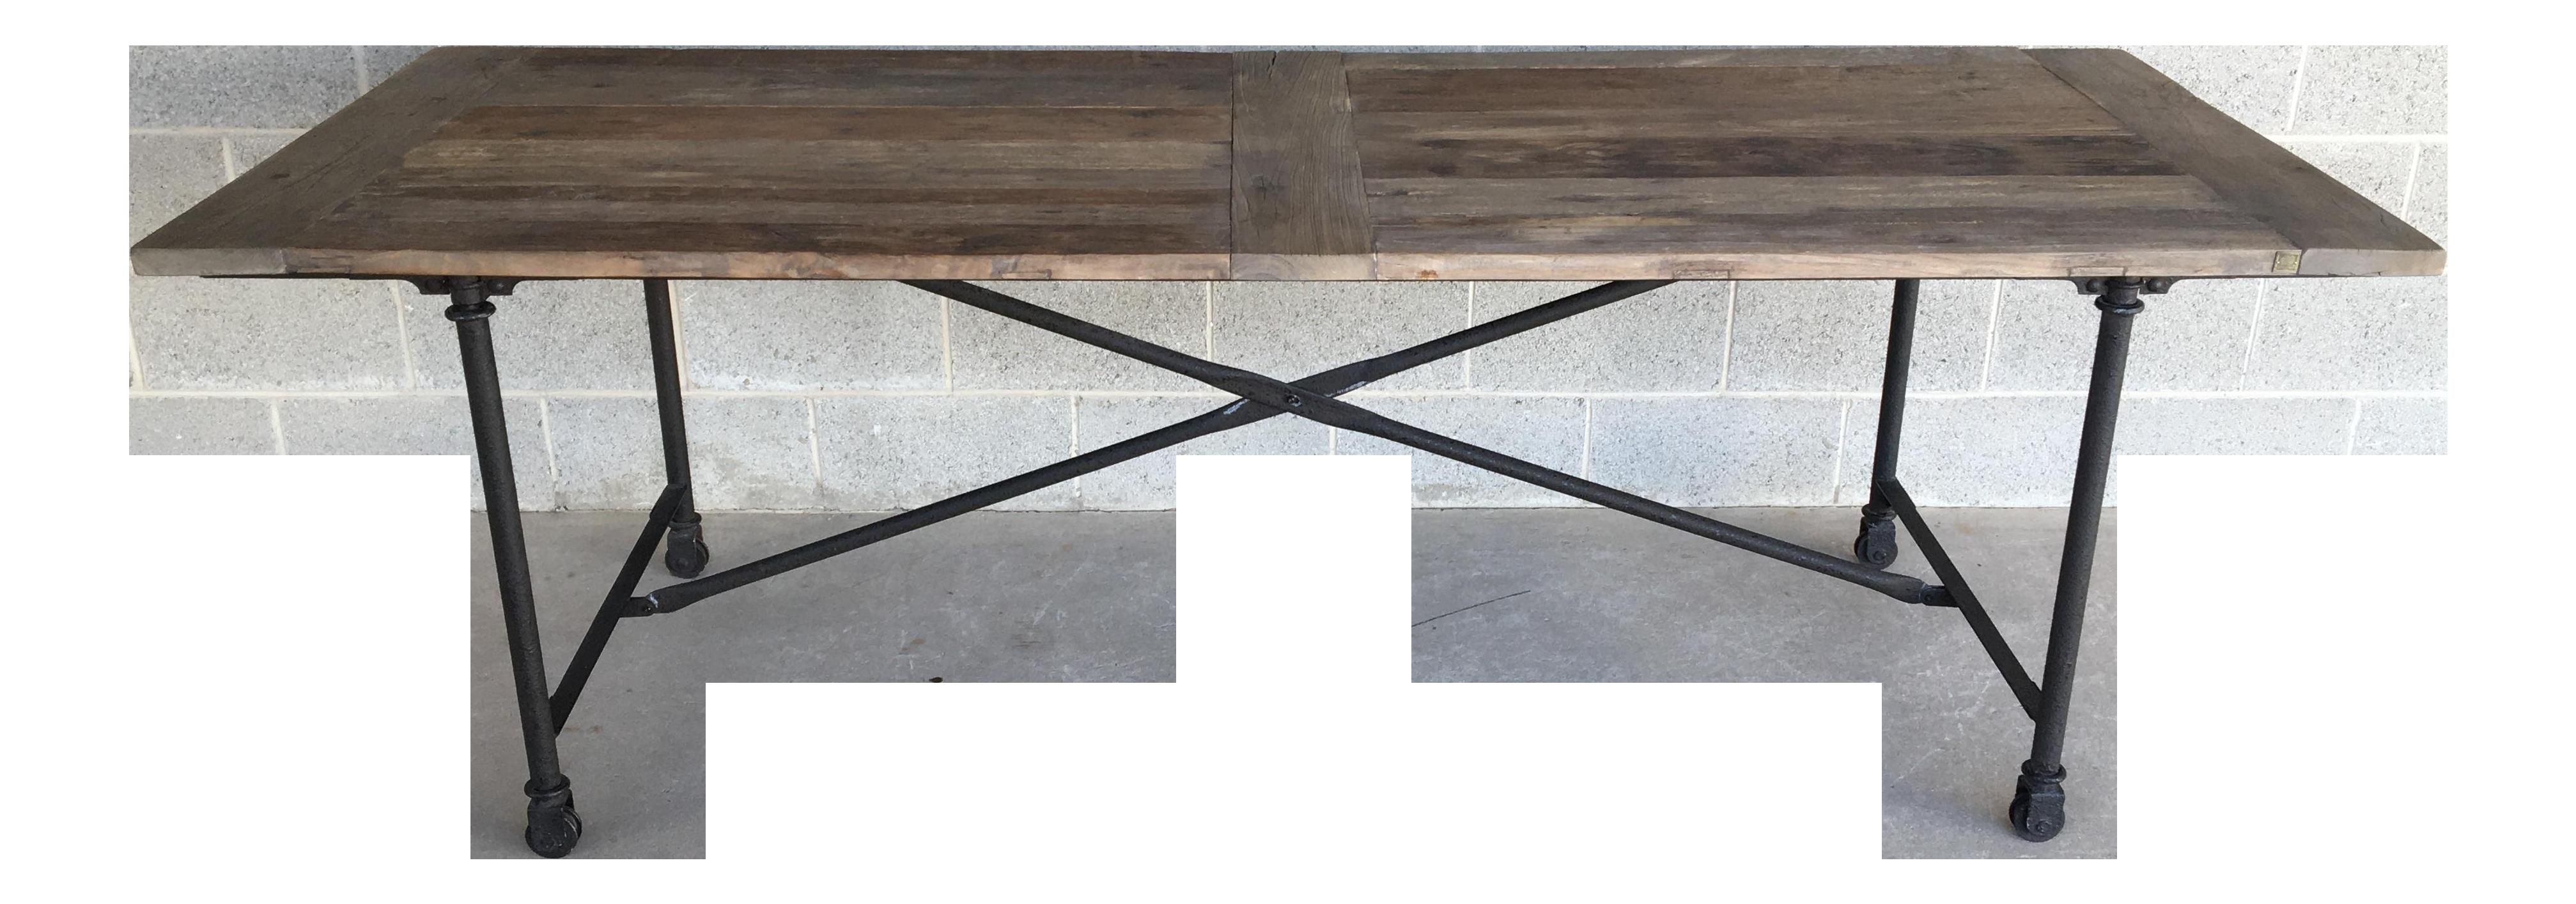 Restoration Hardware Flatiron Rectangular Elm Wood 92 Dining